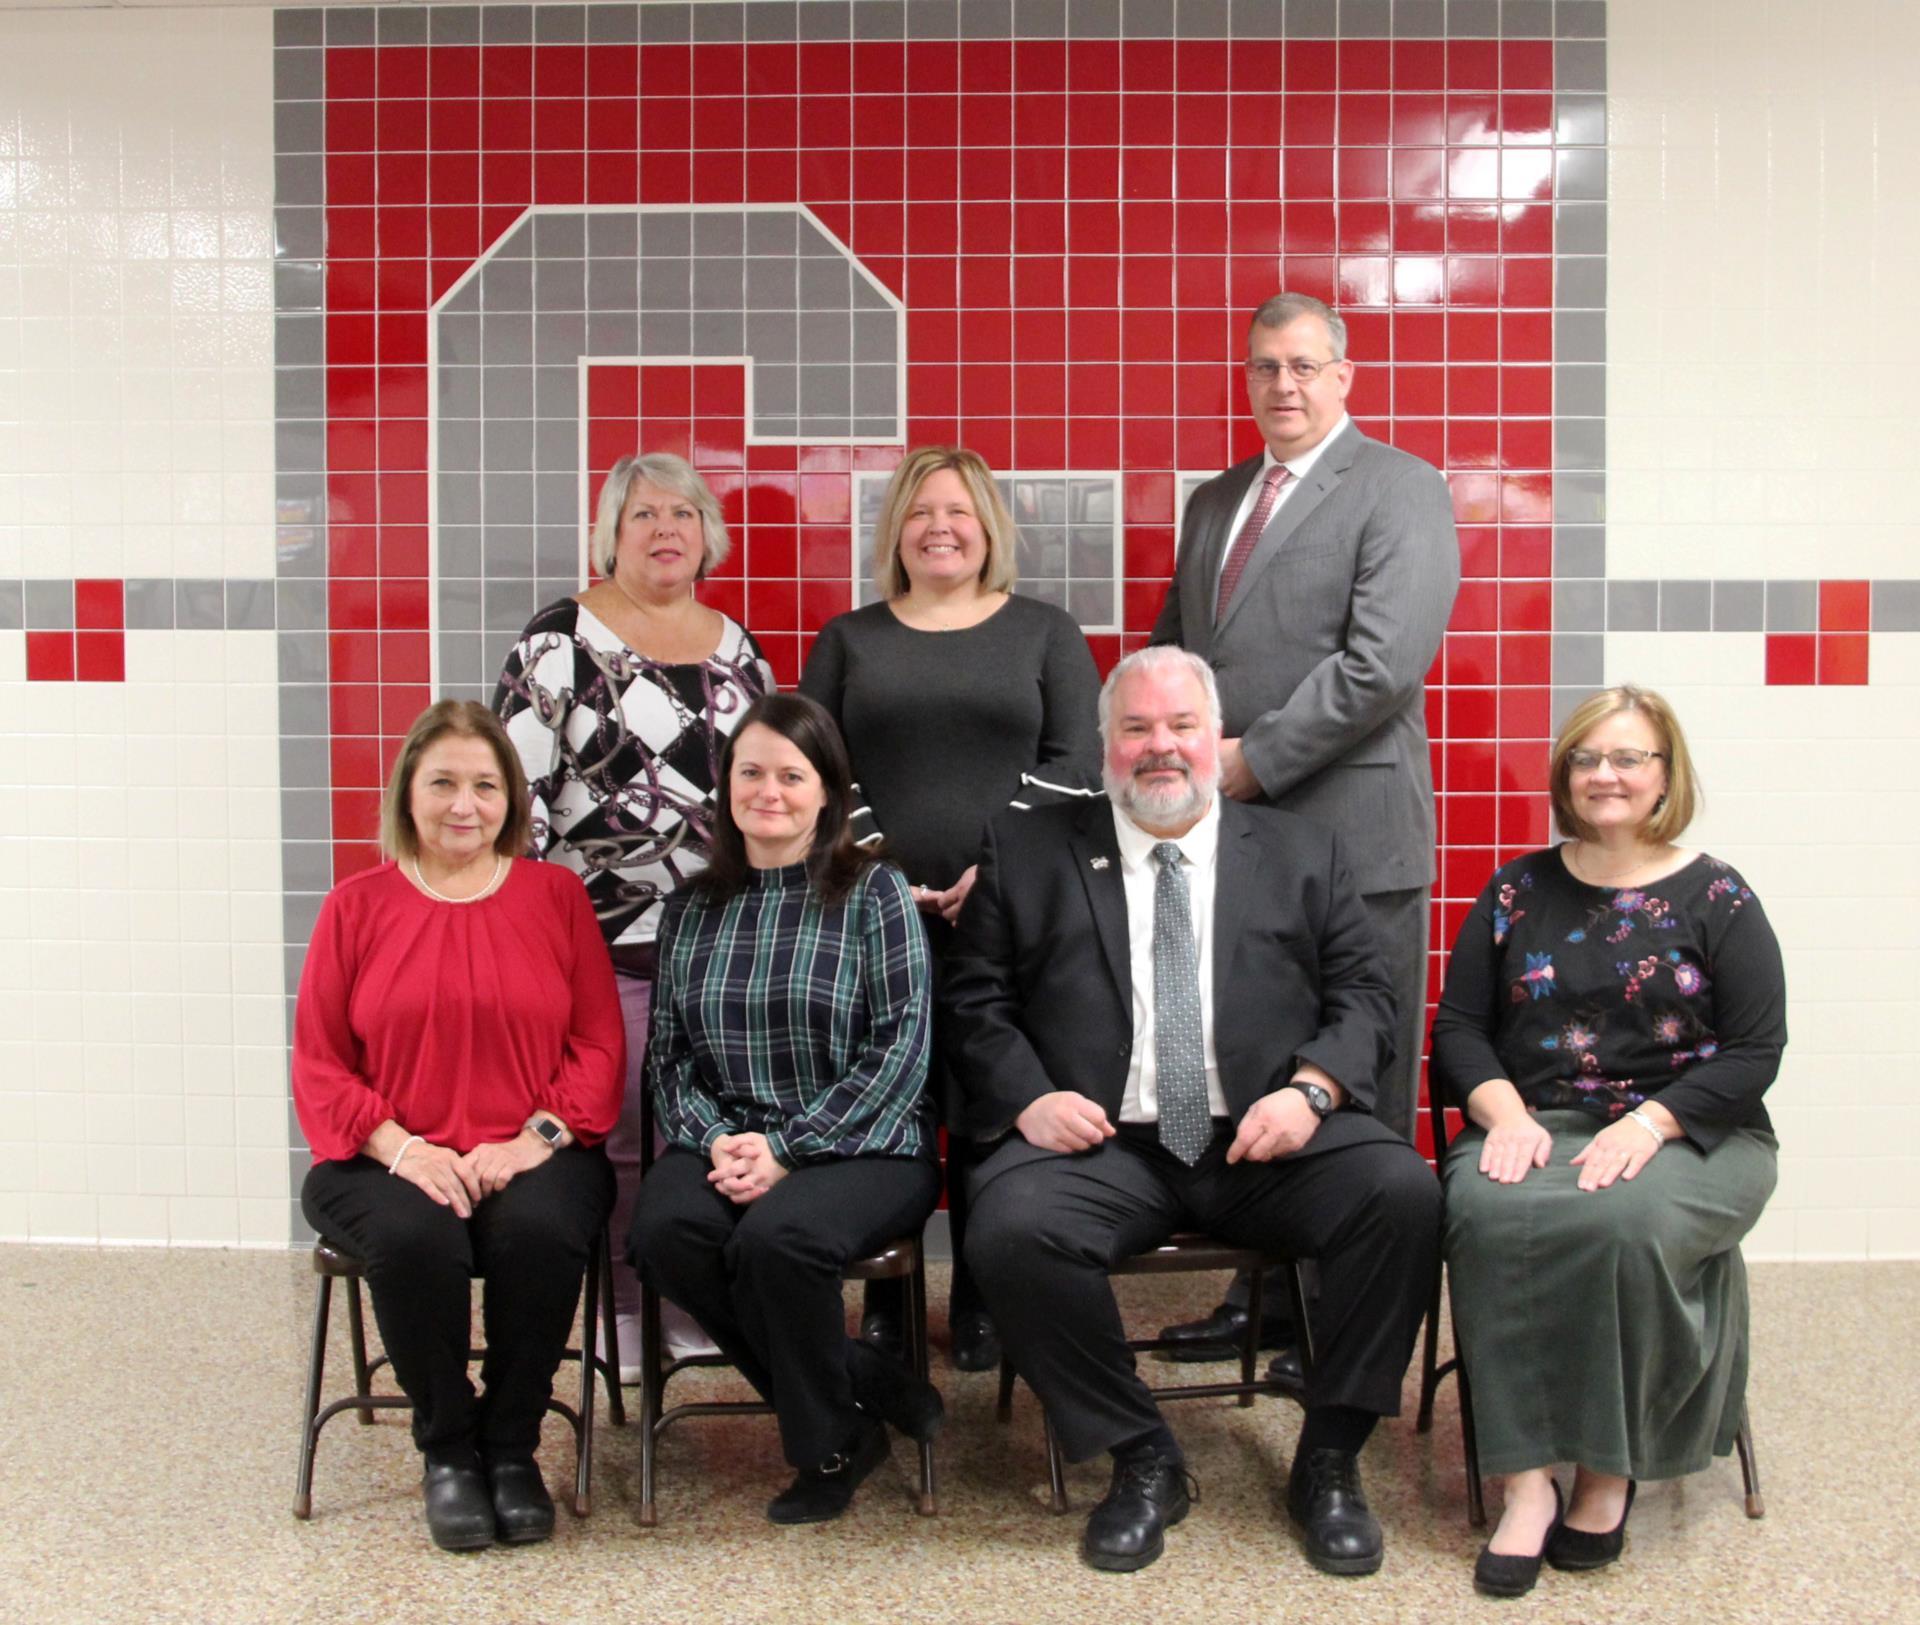 2019 - 2020 Board of Education members